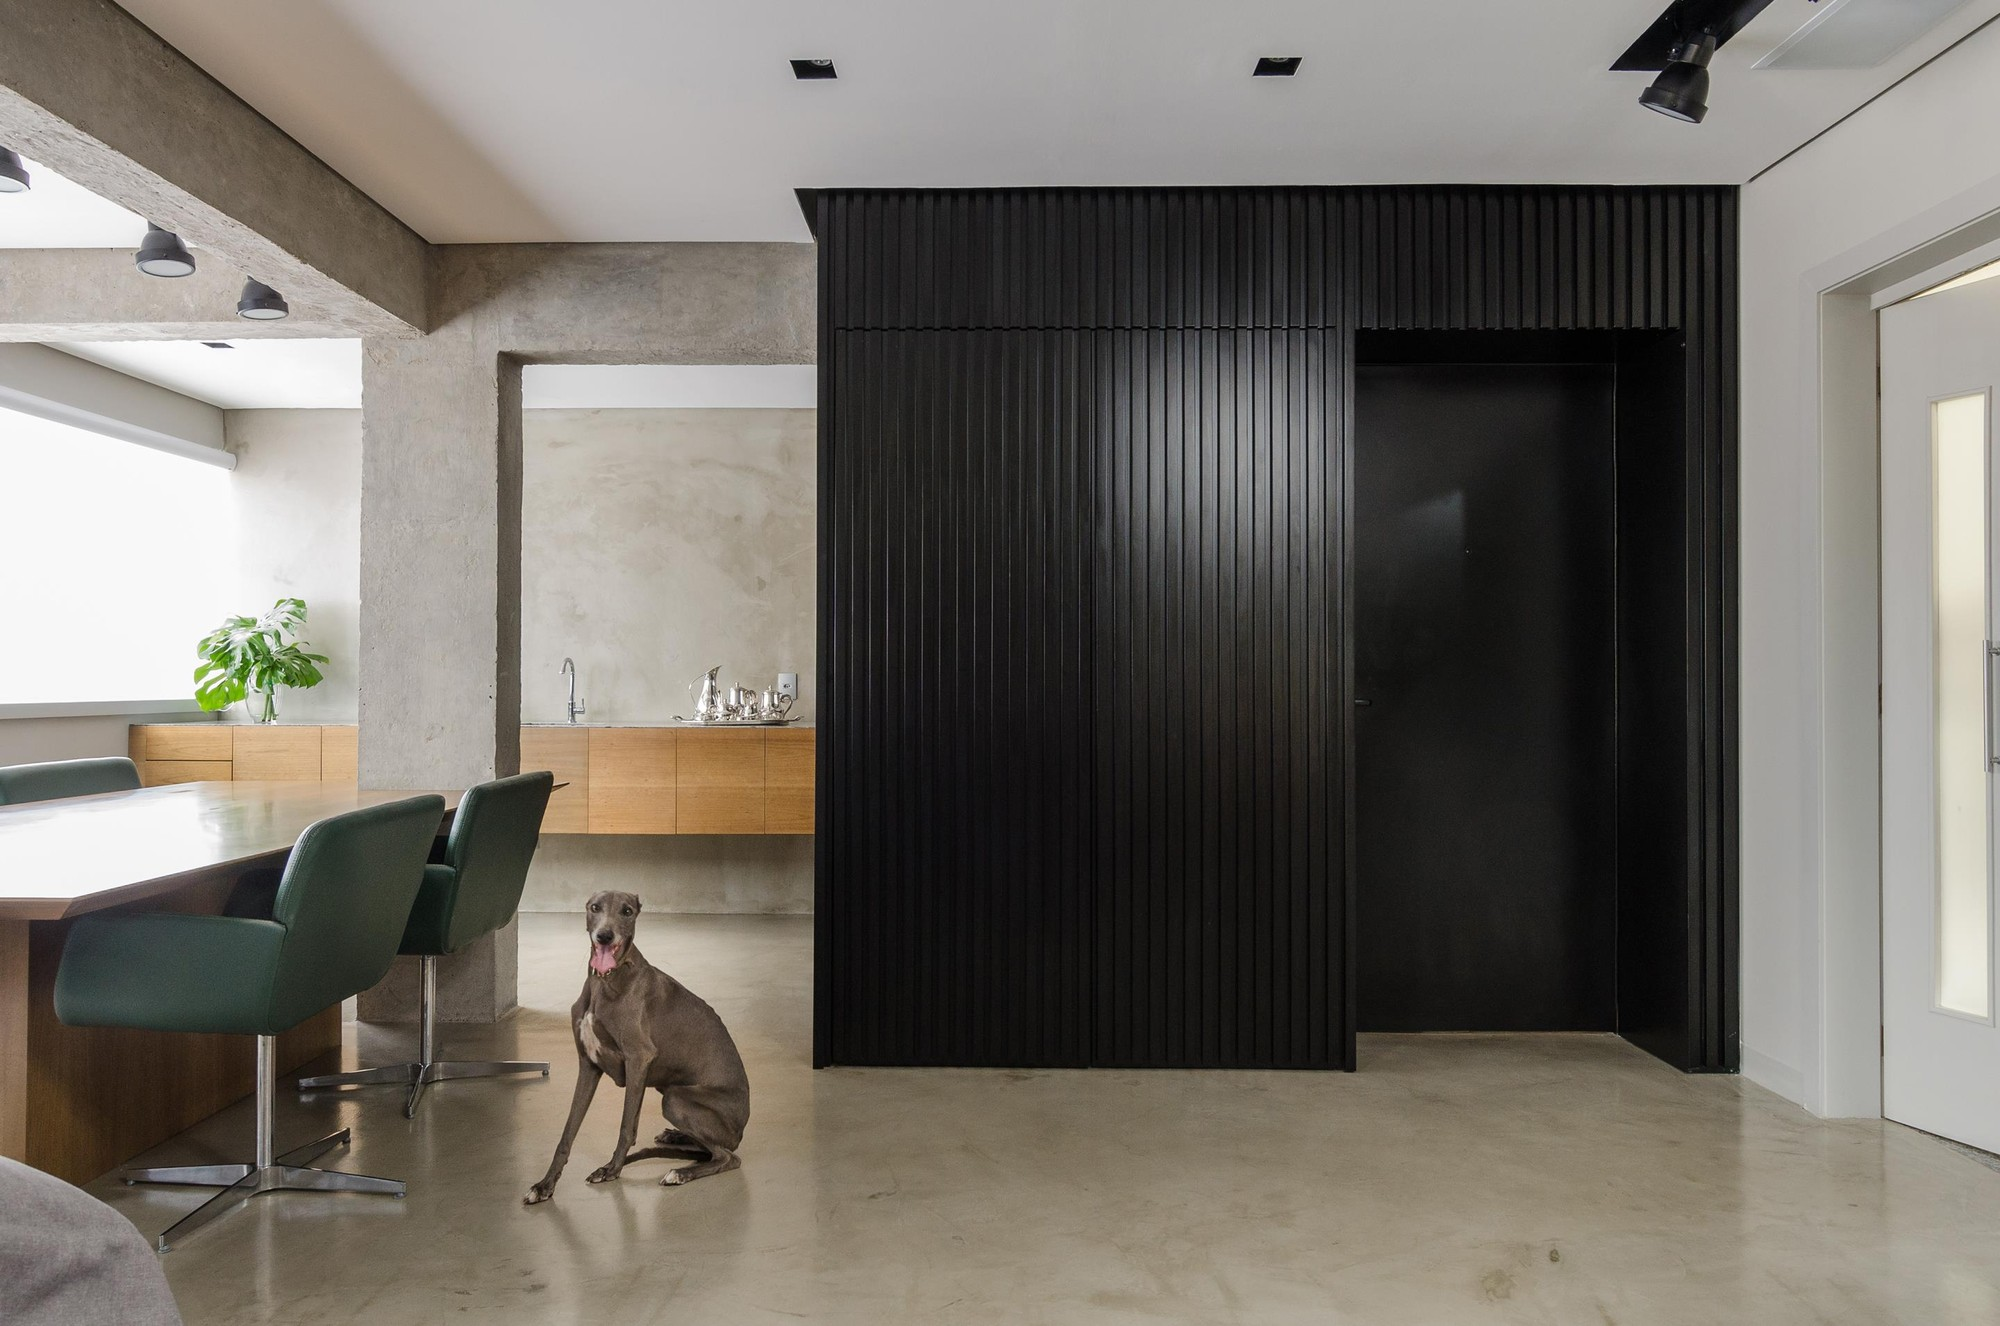 Apartamento GW / AMBIDESTRO, © André Nery